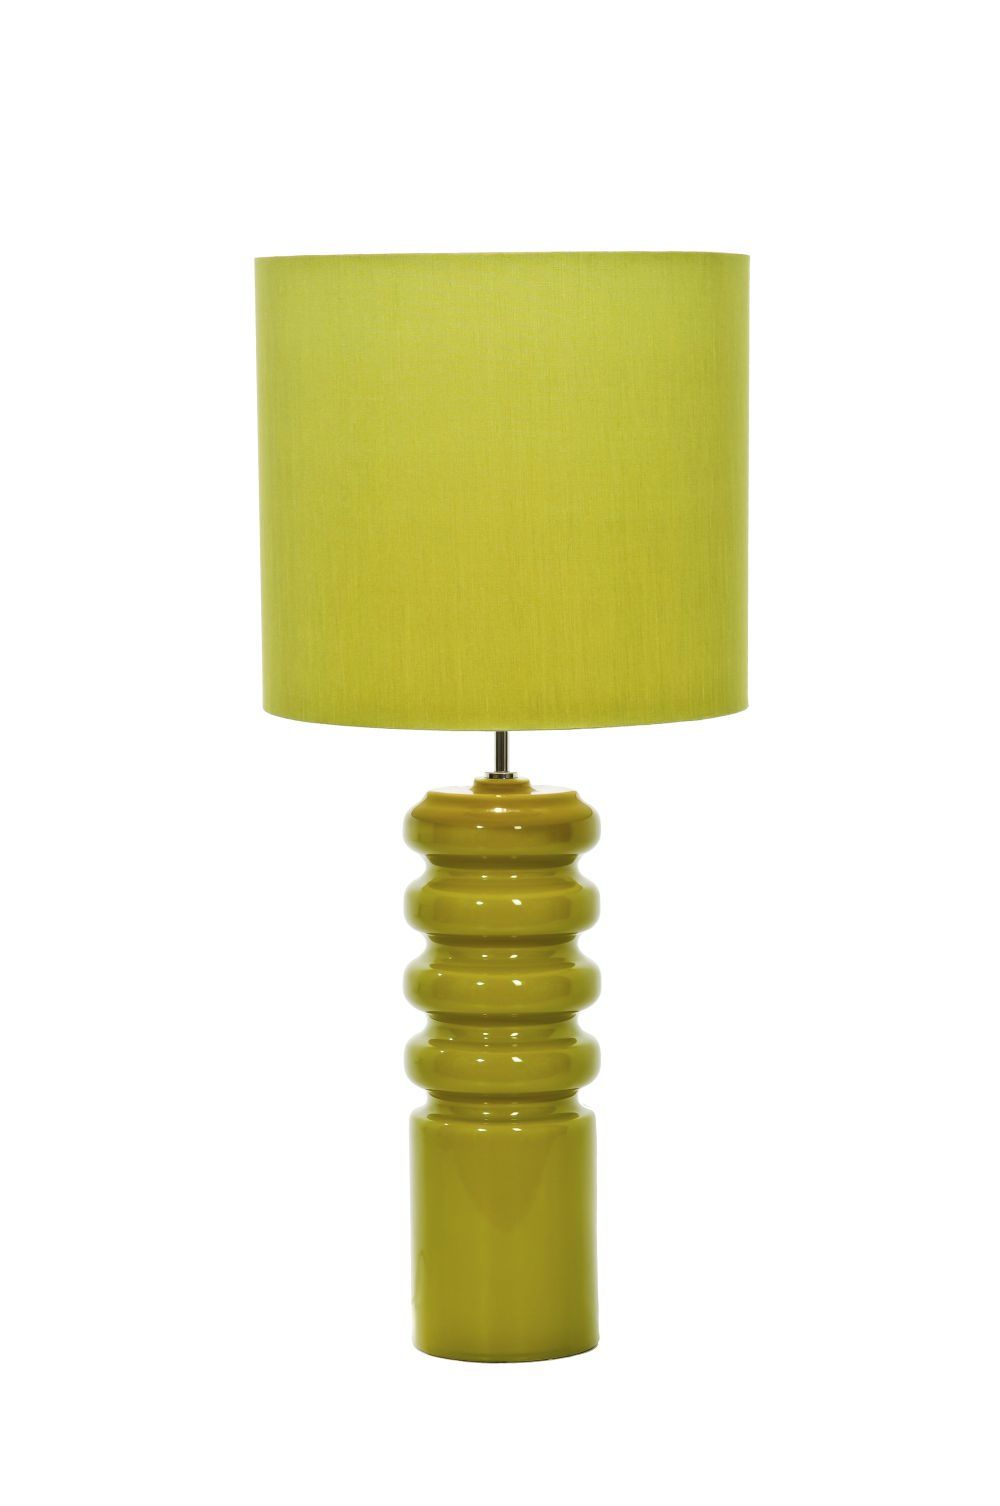 Lime Table Lamp: lime green table lamp photo - 2,Lighting